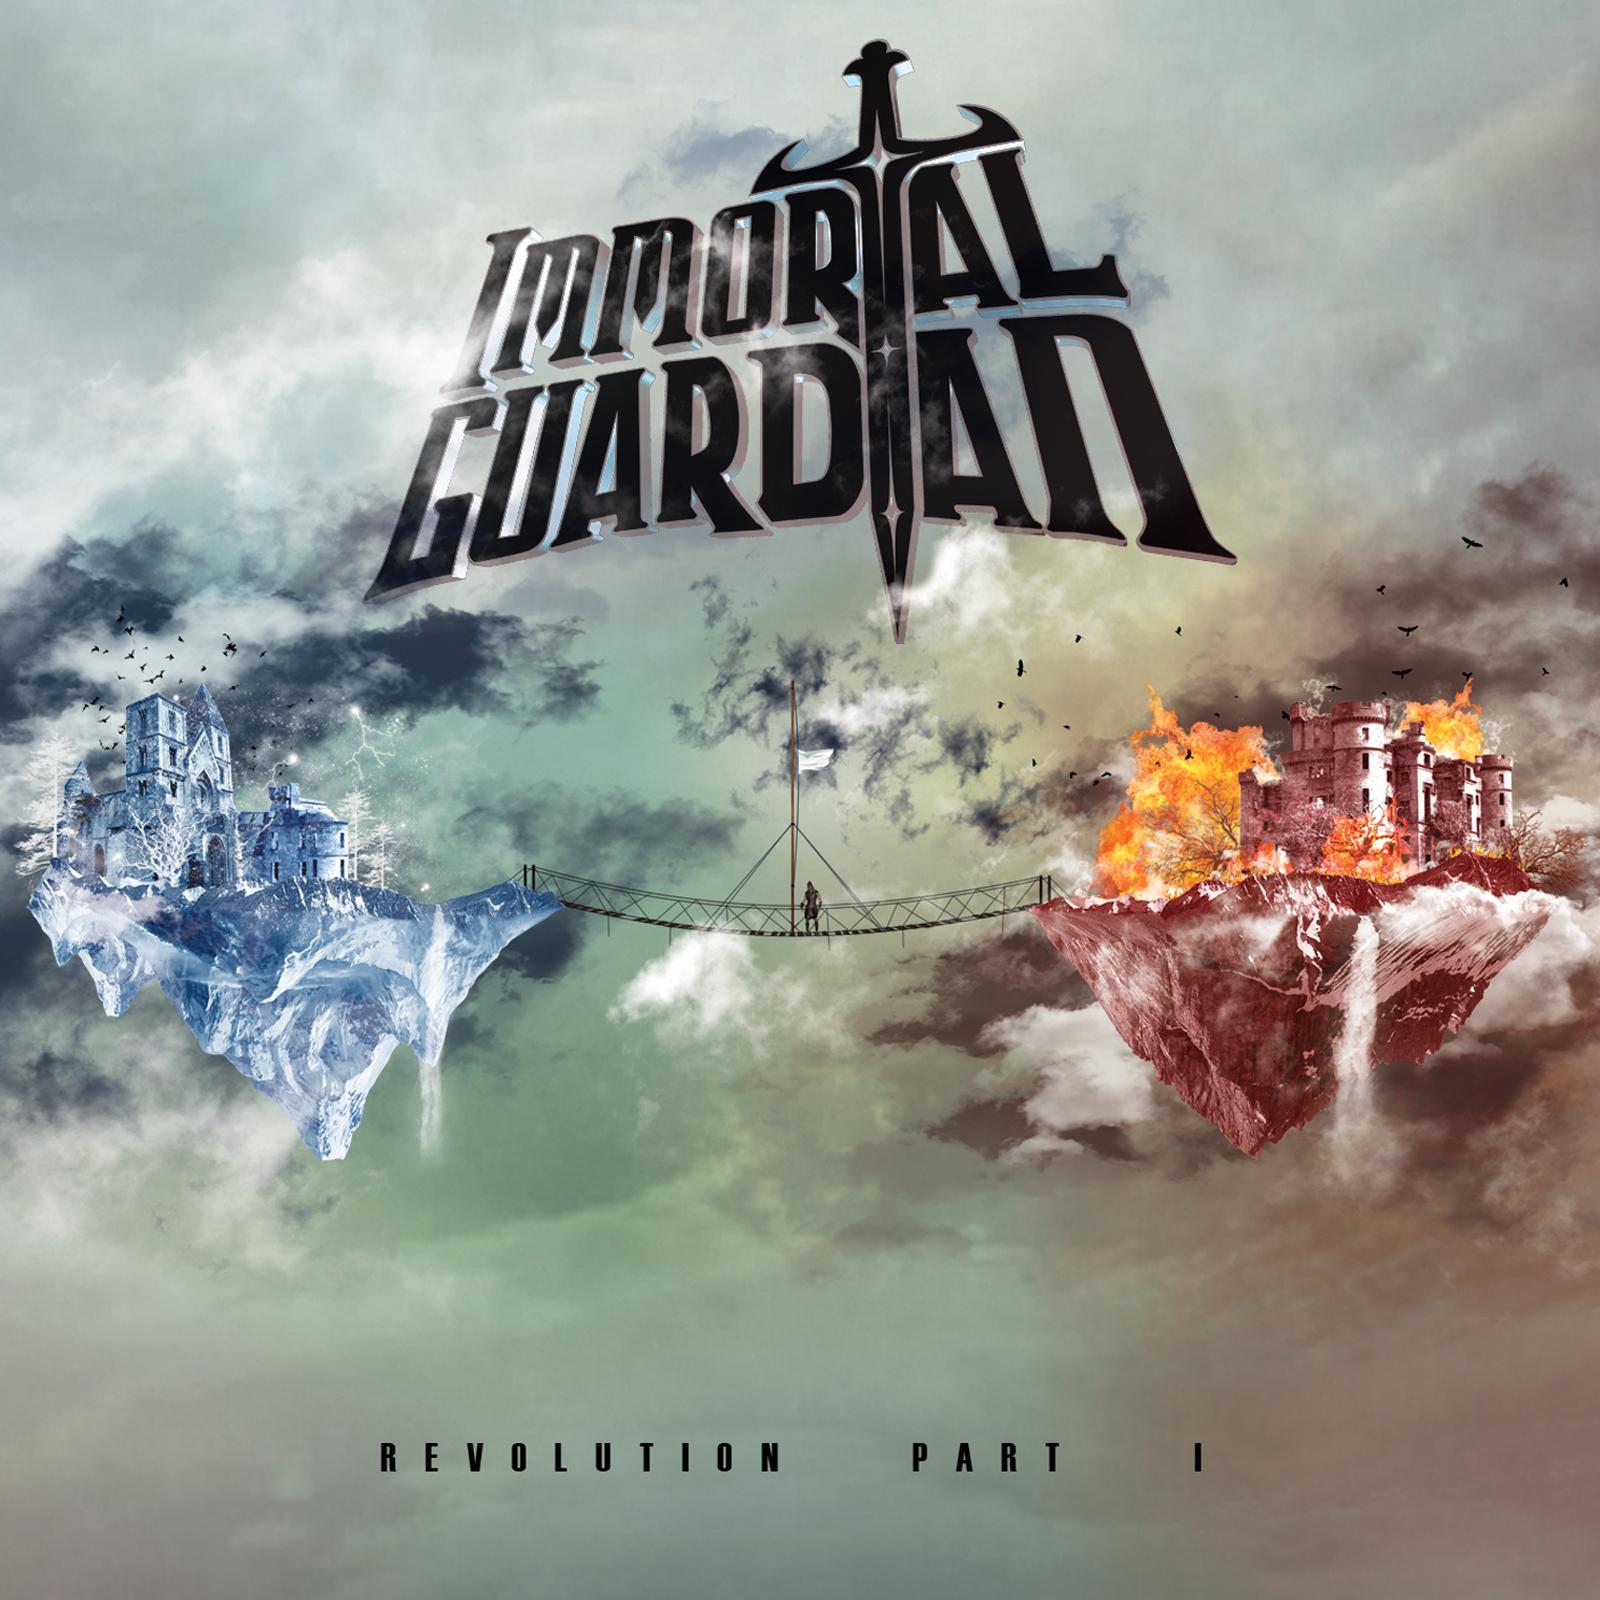 Revolution Part I (iTunes thumbnail)